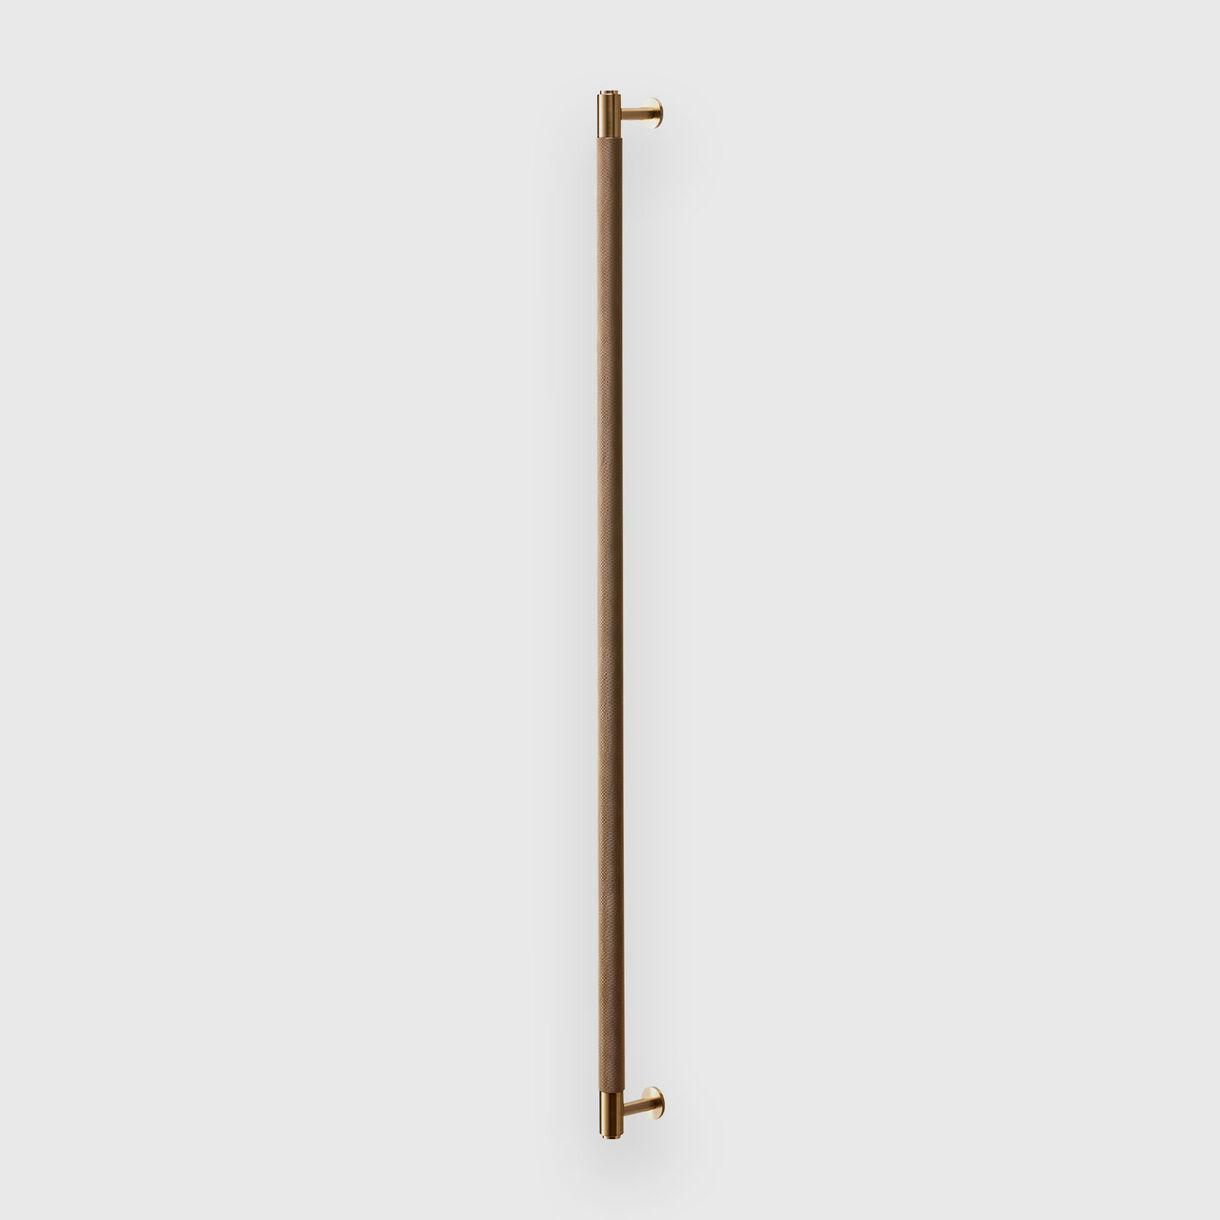 Double Sided Closet Bar, Brass